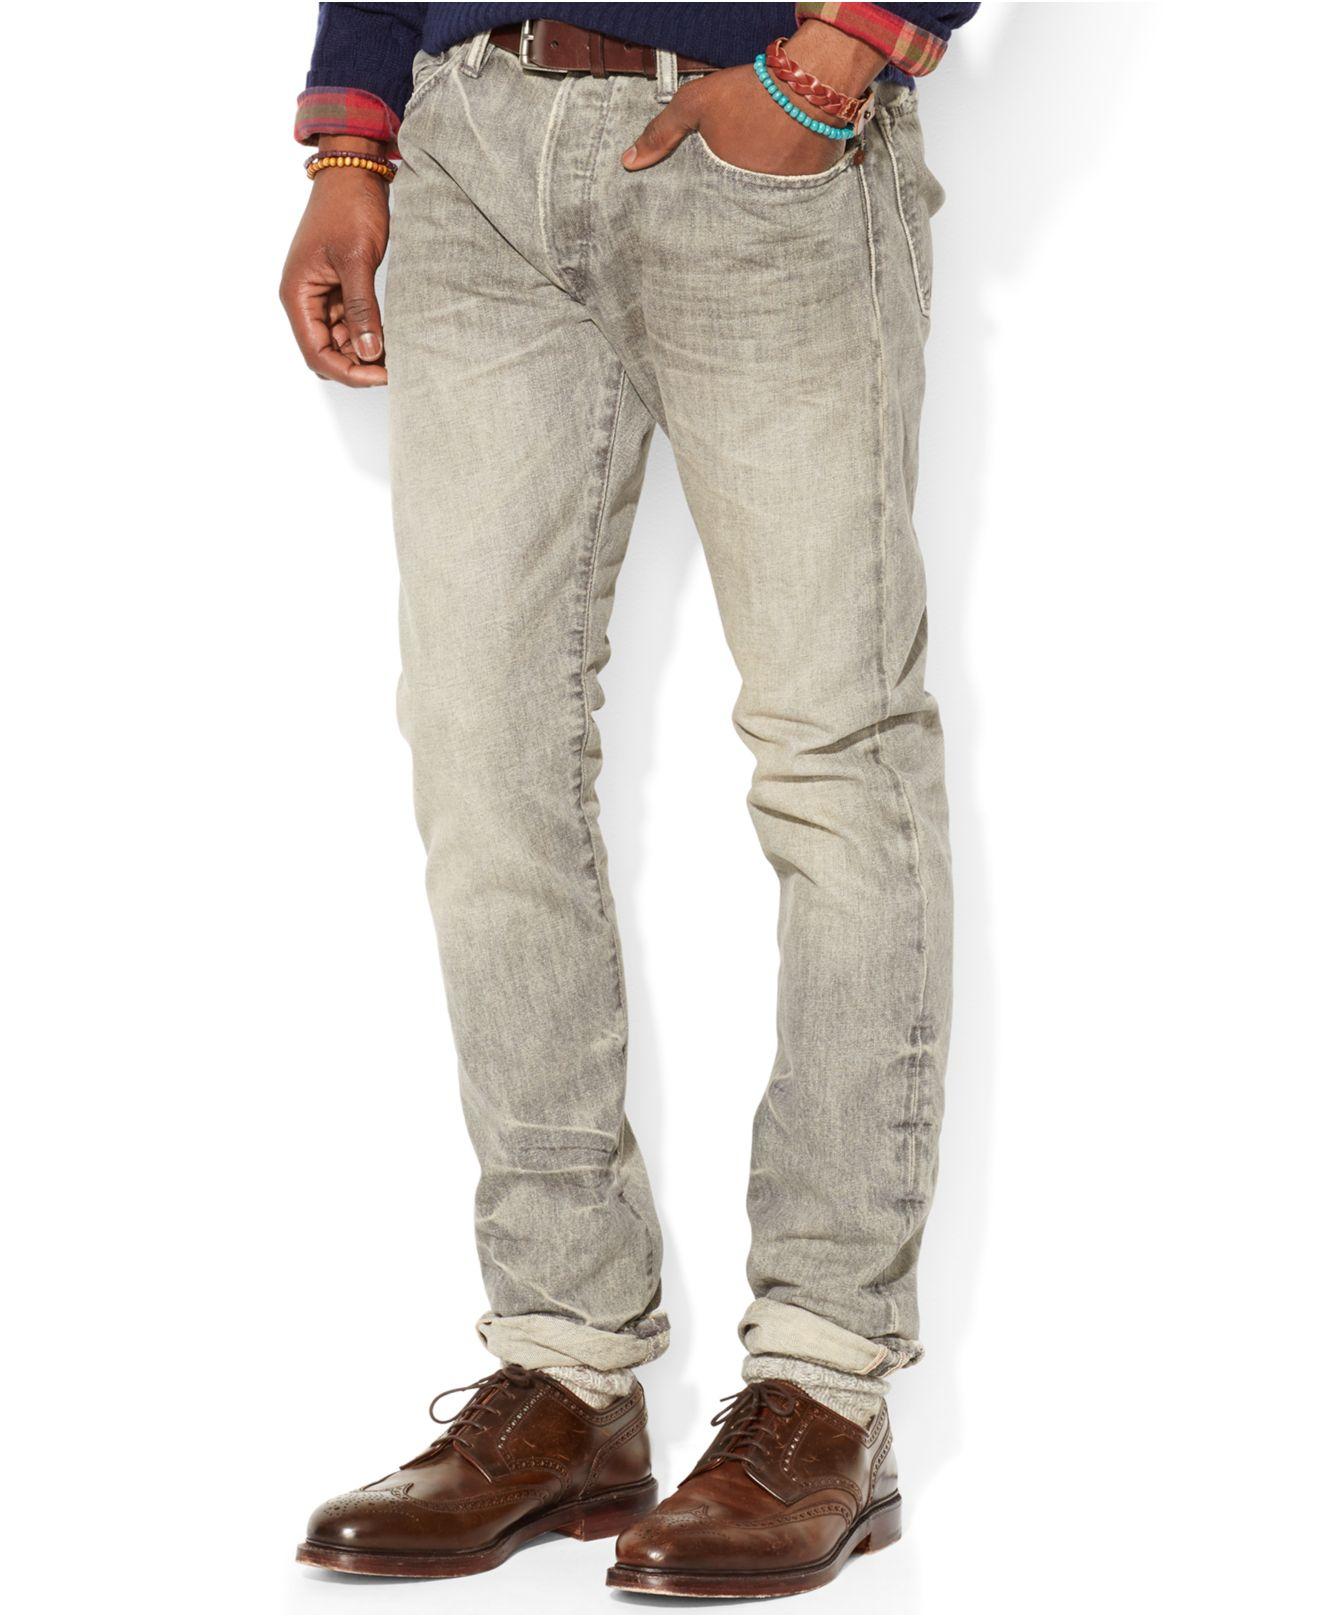 695b8f78 Polo Ralph Lauren Gray Slim-fit Varick Ash-grey Jeans for men